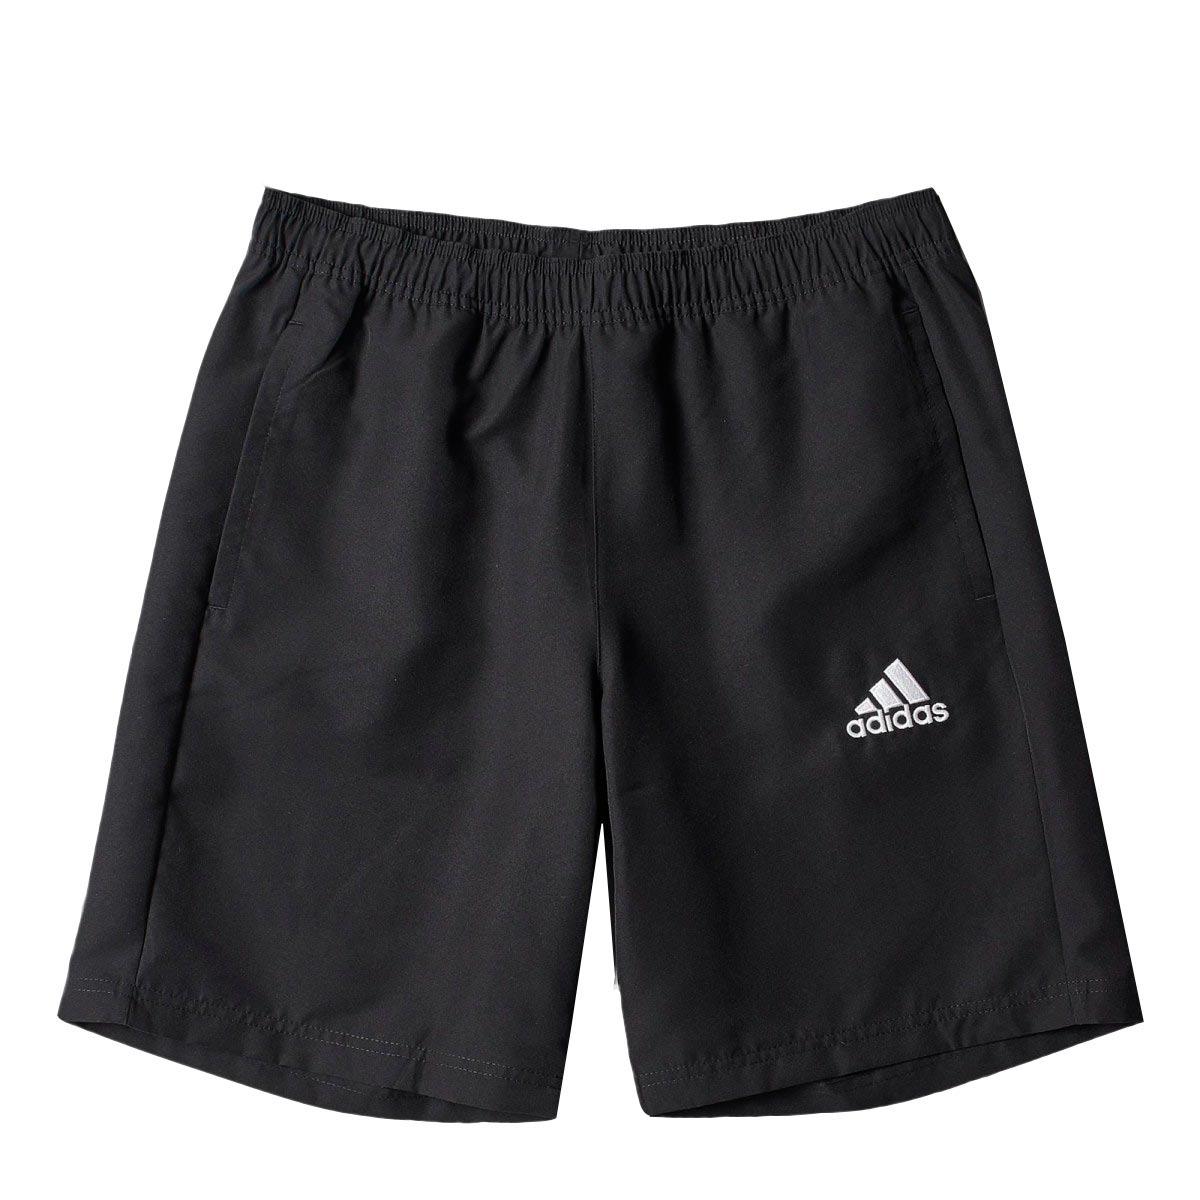 79e2392bb0 shorts masculino adidas core 15 futebol m35338. Carregando zoom.